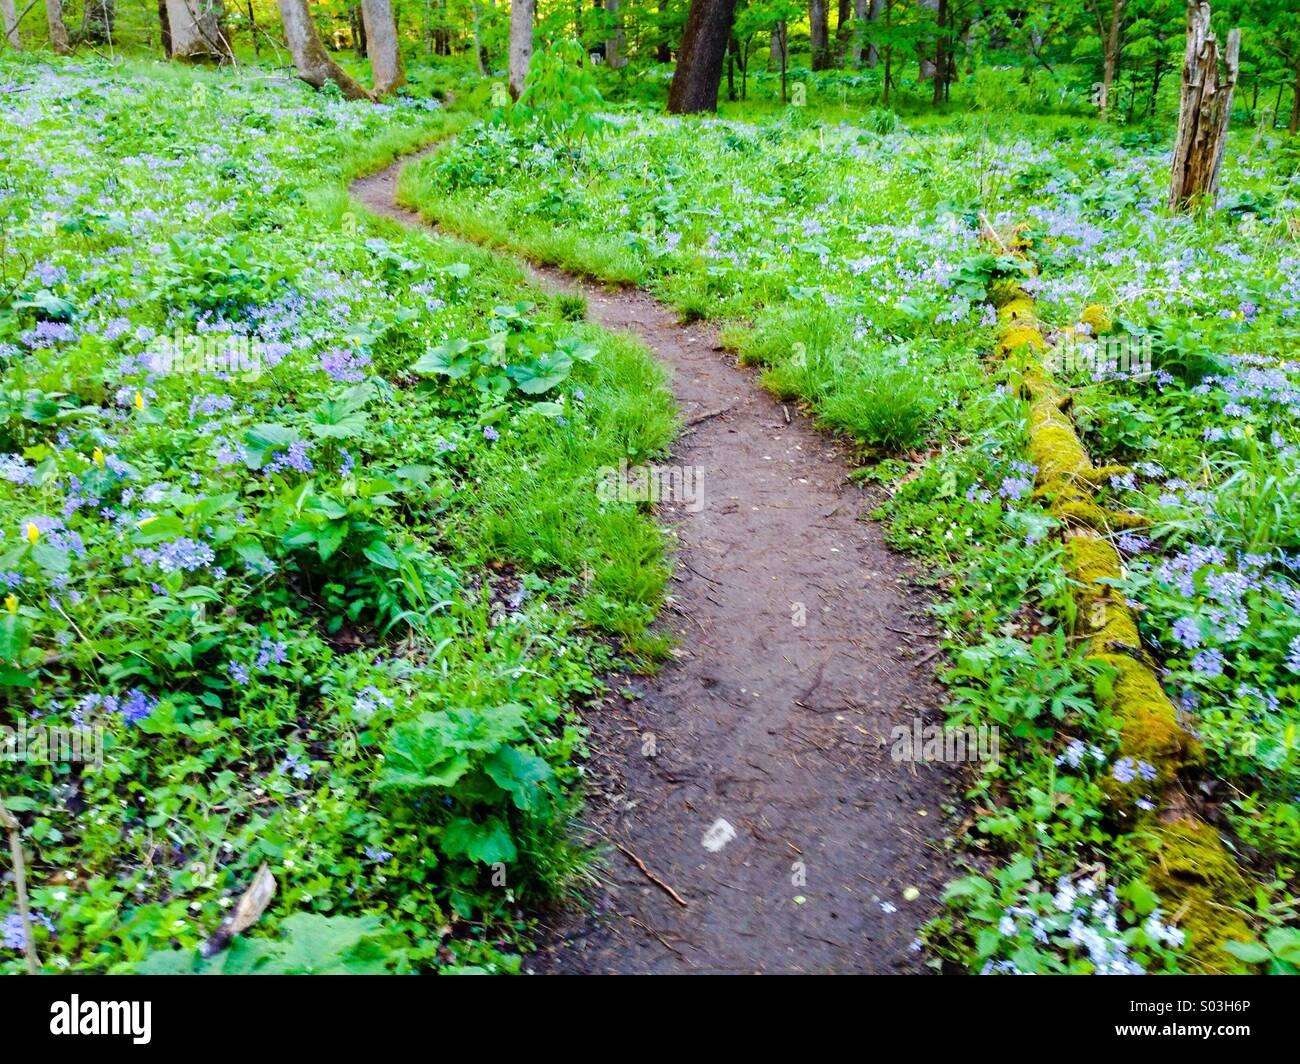 Path in Whiteoak Sink, Smokies - Stock Image